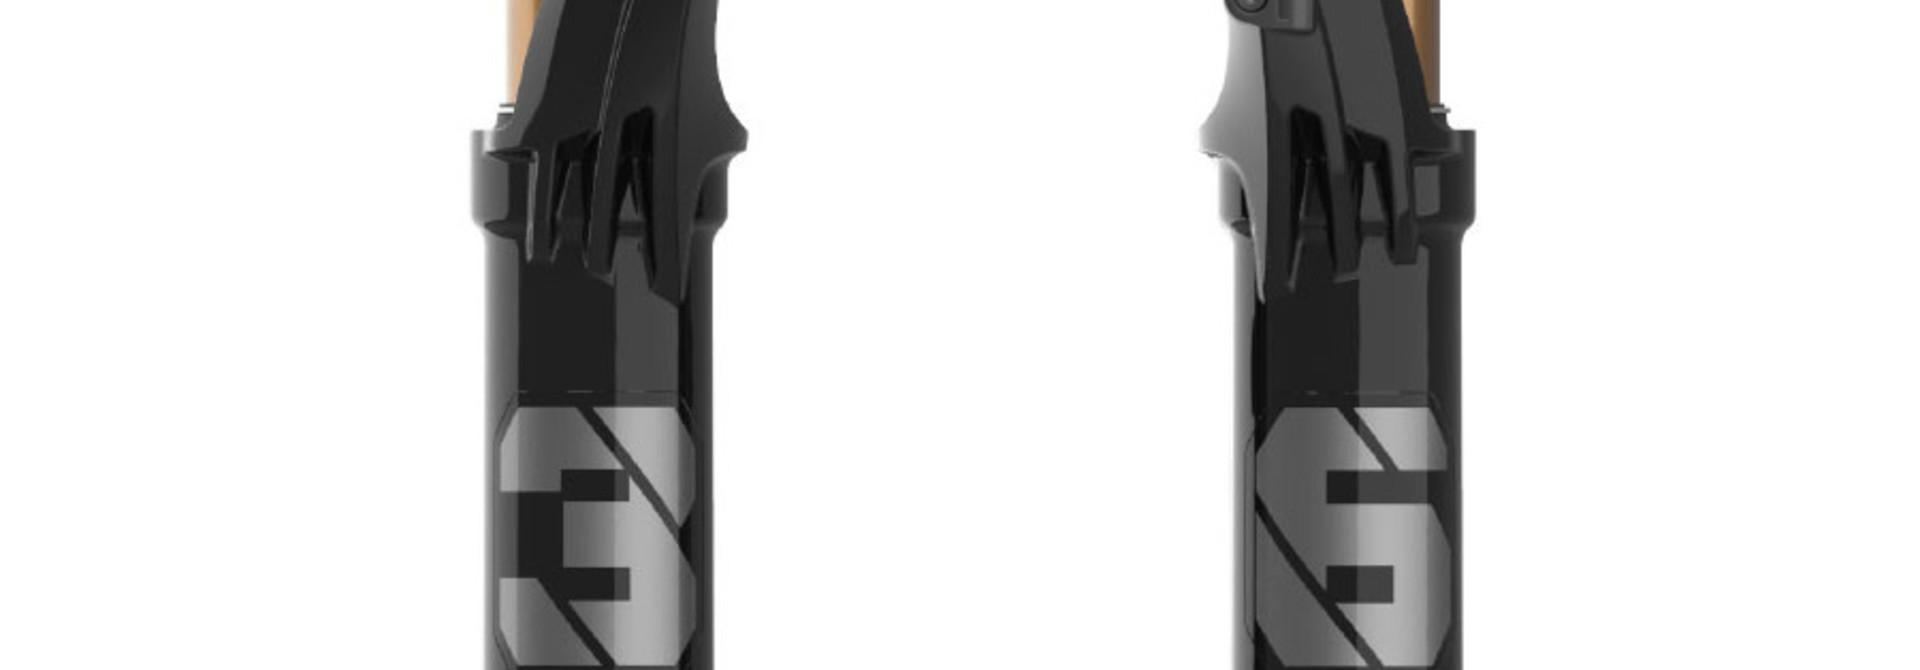 "2021 FOX Float Factory 36, 29"", 150mm, FIT4, 3Pos-Adj, 15QRx110, 51mm Rake,Shiny Blk"